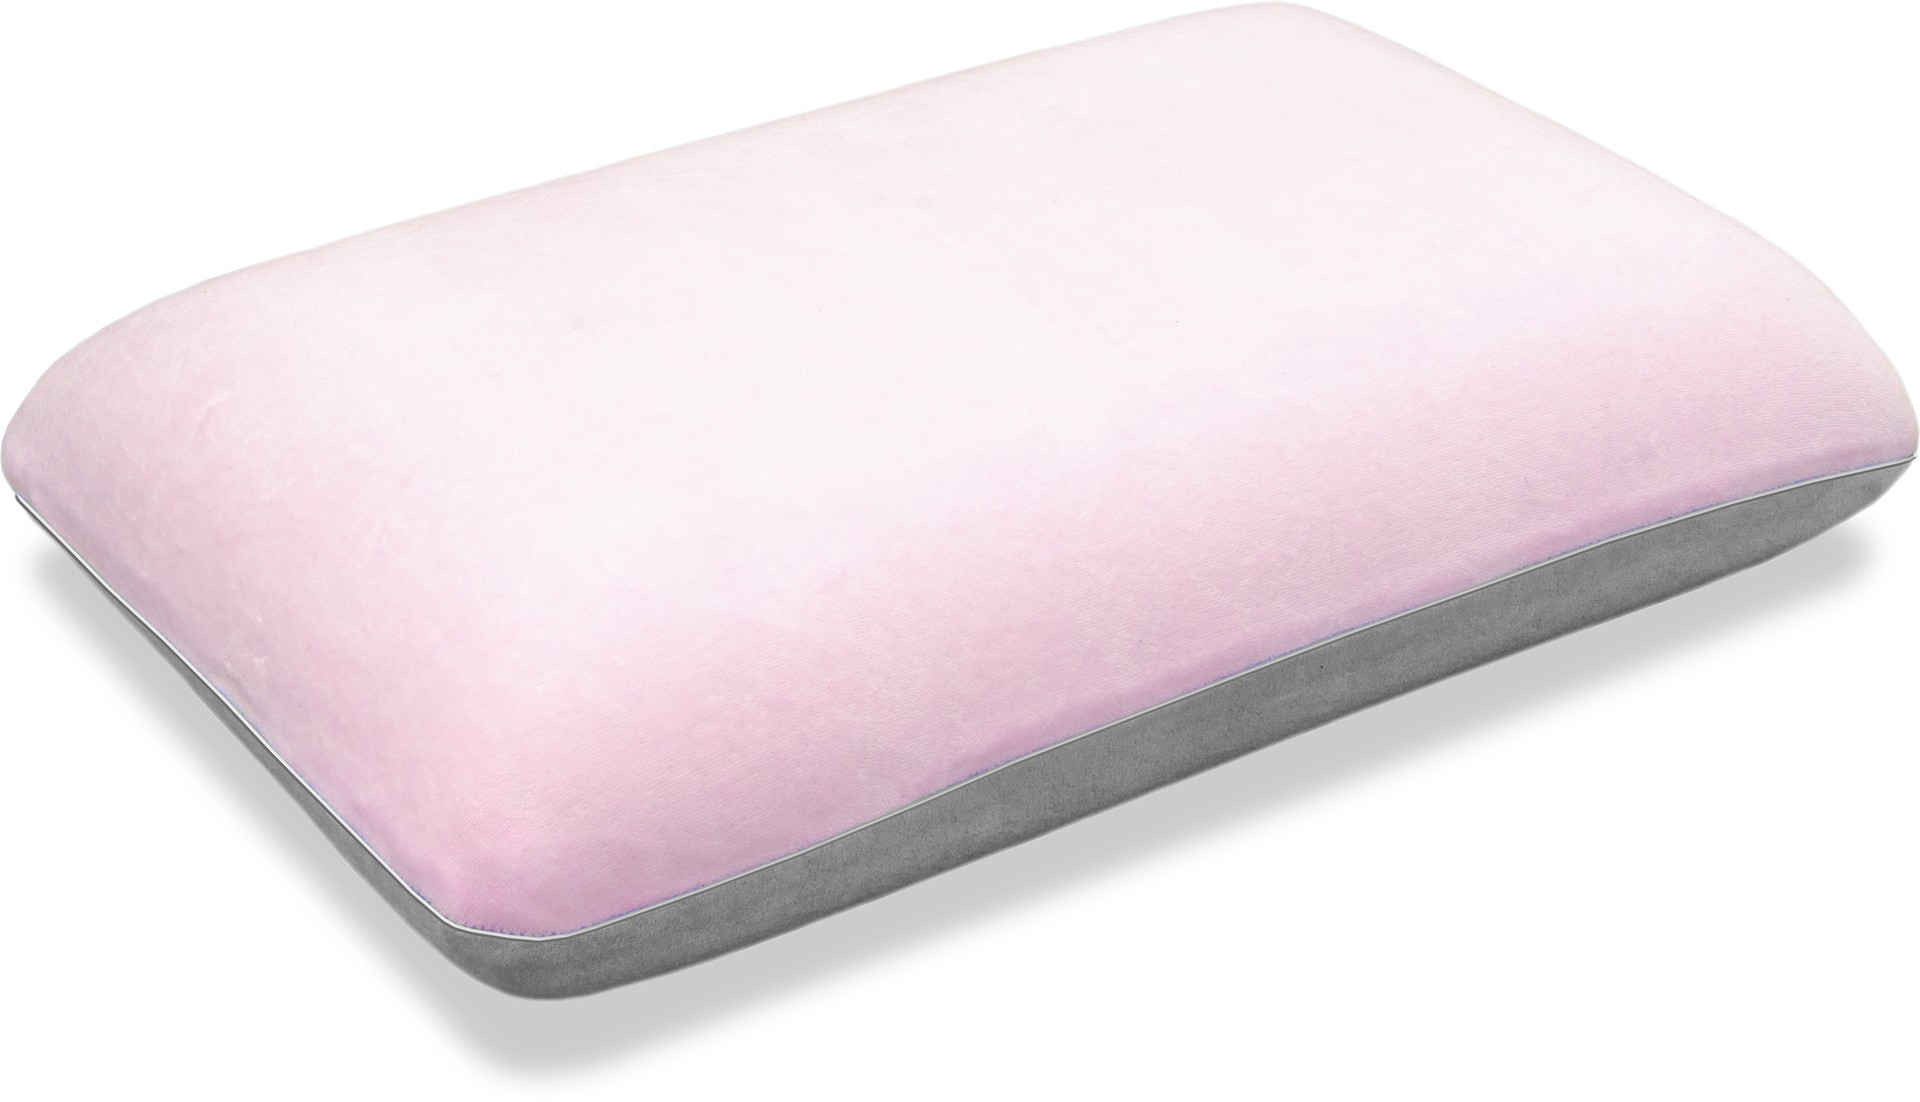 Подушки Revery Подушка Для Нее Цвет: Розовый, Серый (60х39х12) подушки revery подушка be healthy